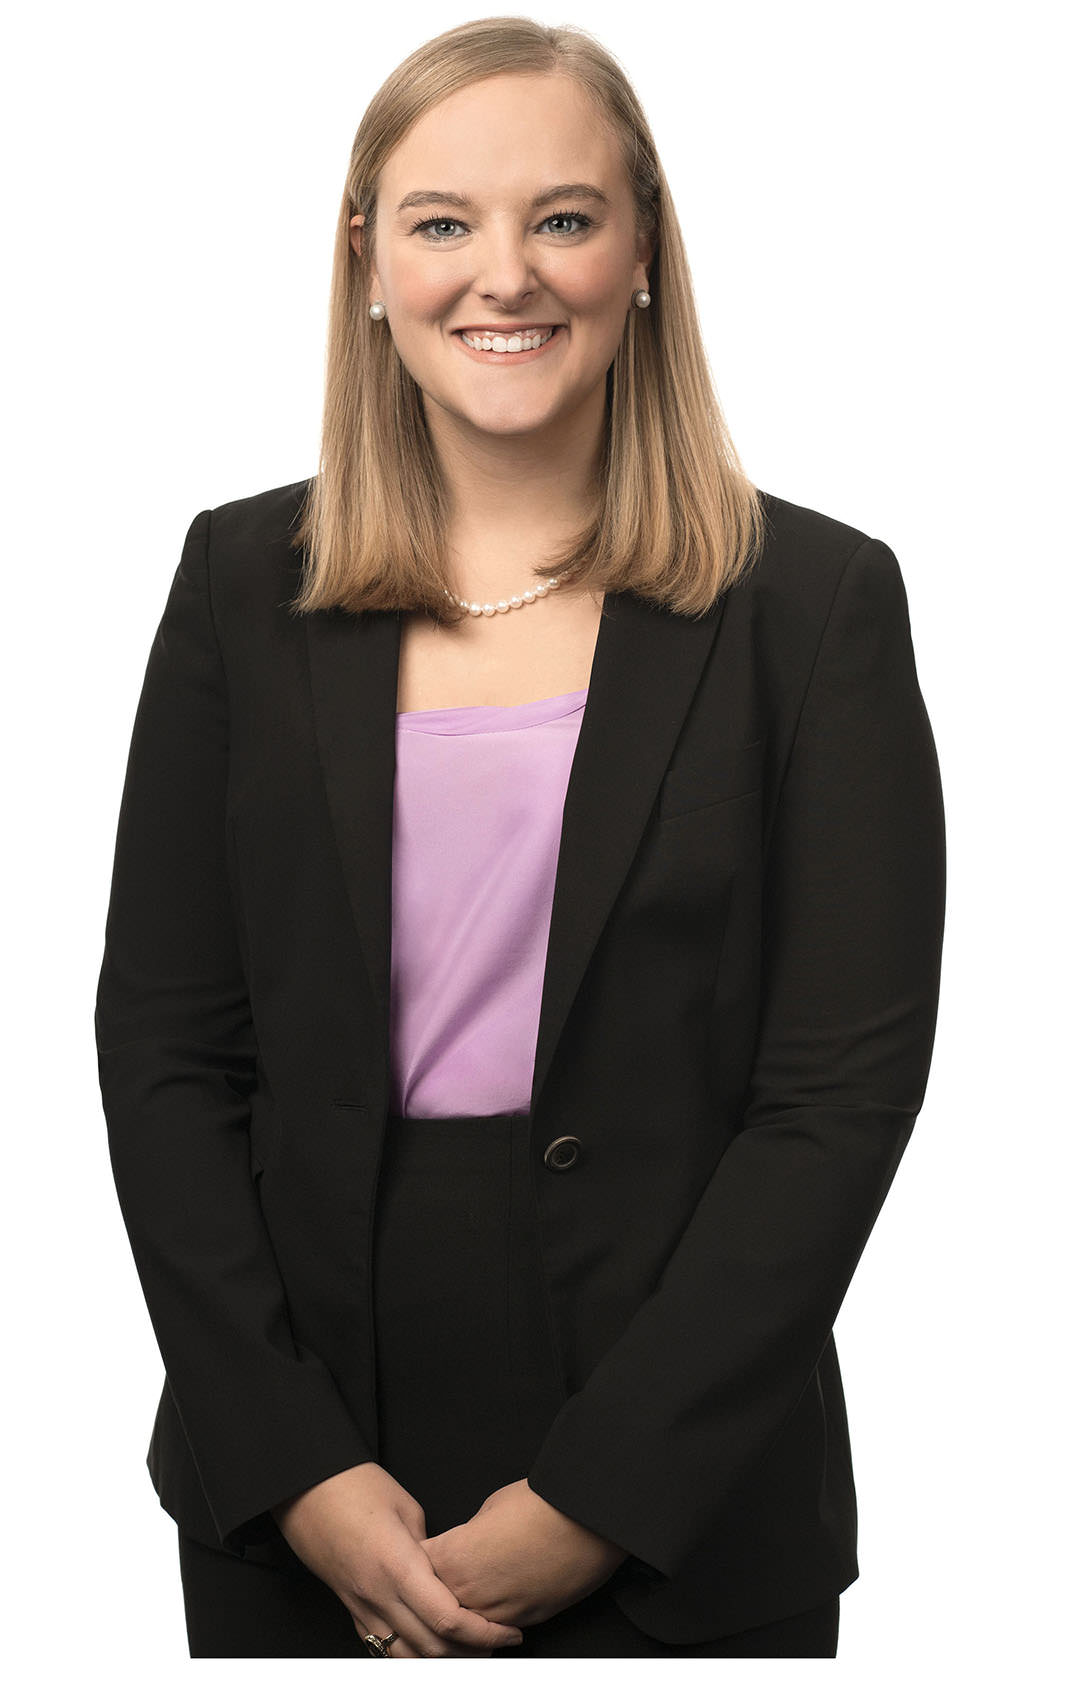 Elizabeth A. DeVos